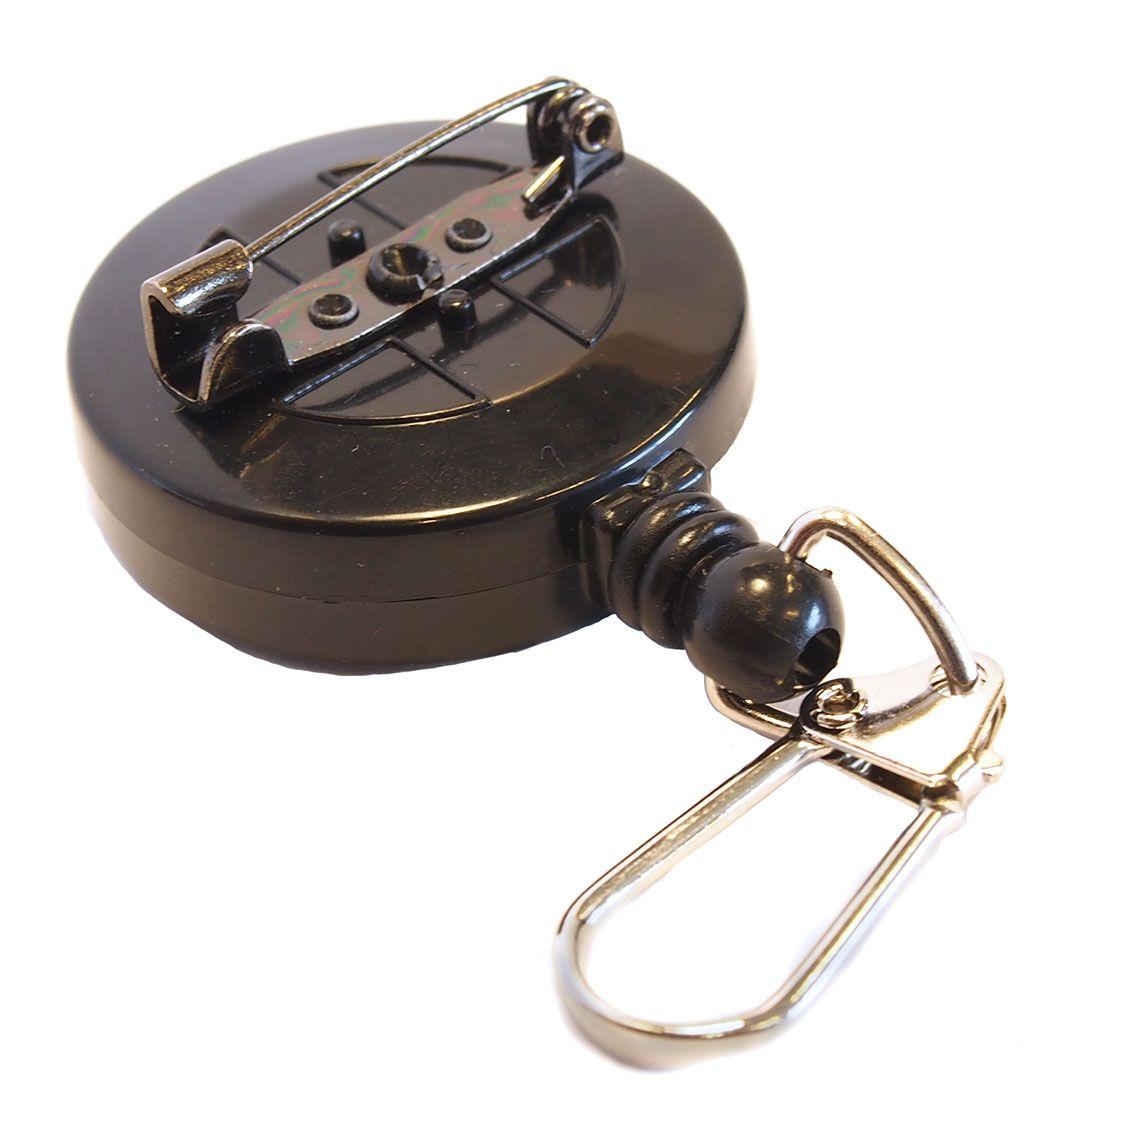 Retrátil Anglers Image X-Long Zinger Pin-On